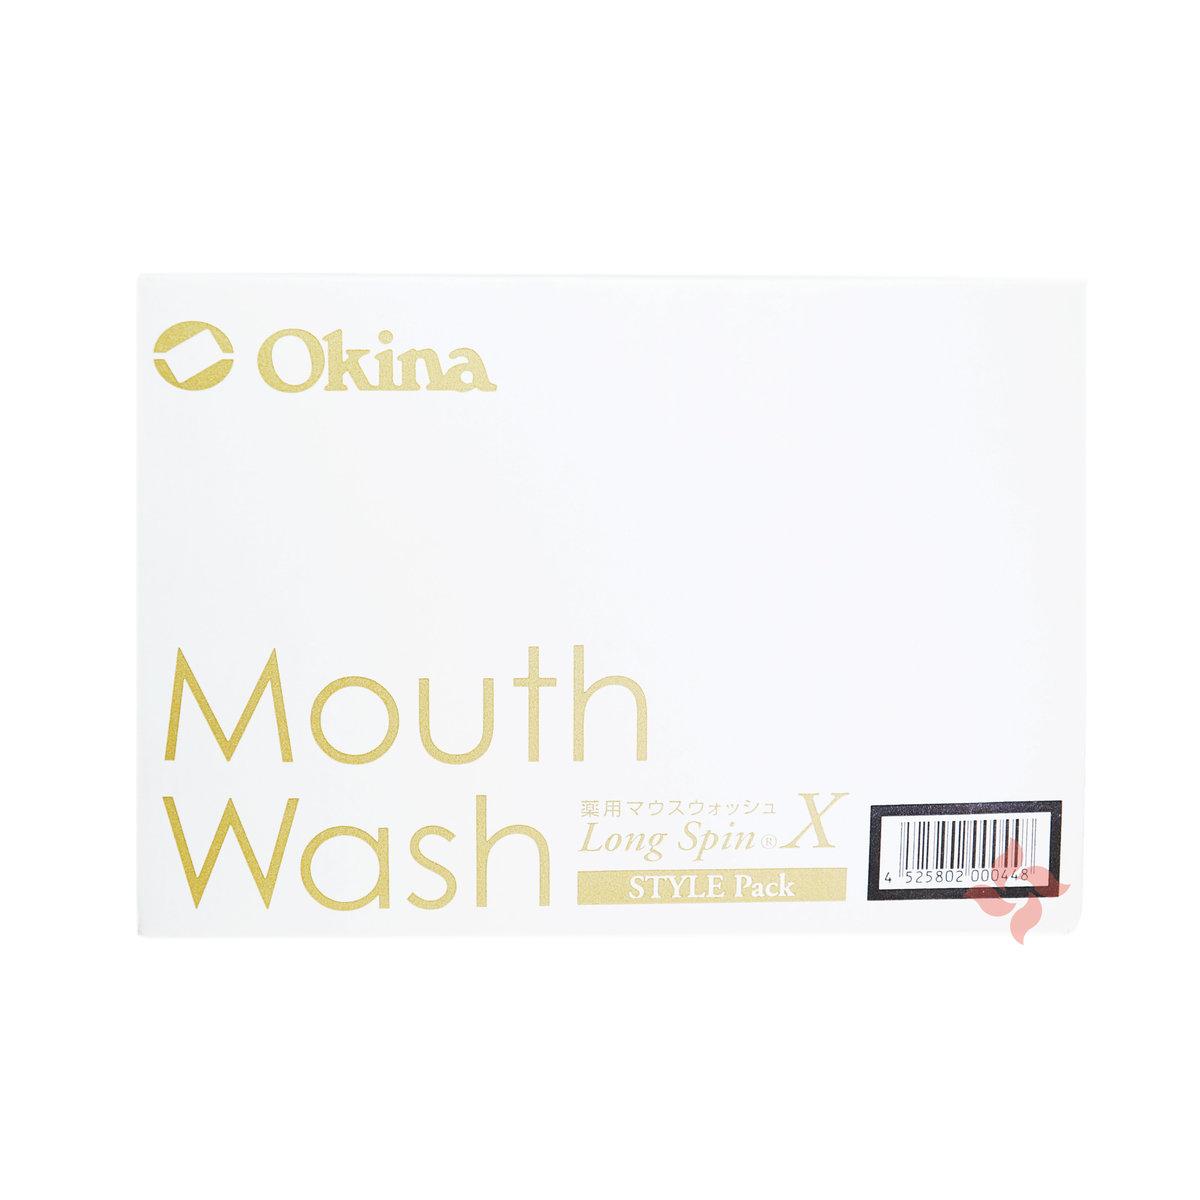 Long Spin X Portable Mouth Wash 12ml x 100pcs Mint (Blue) (4525802000448)